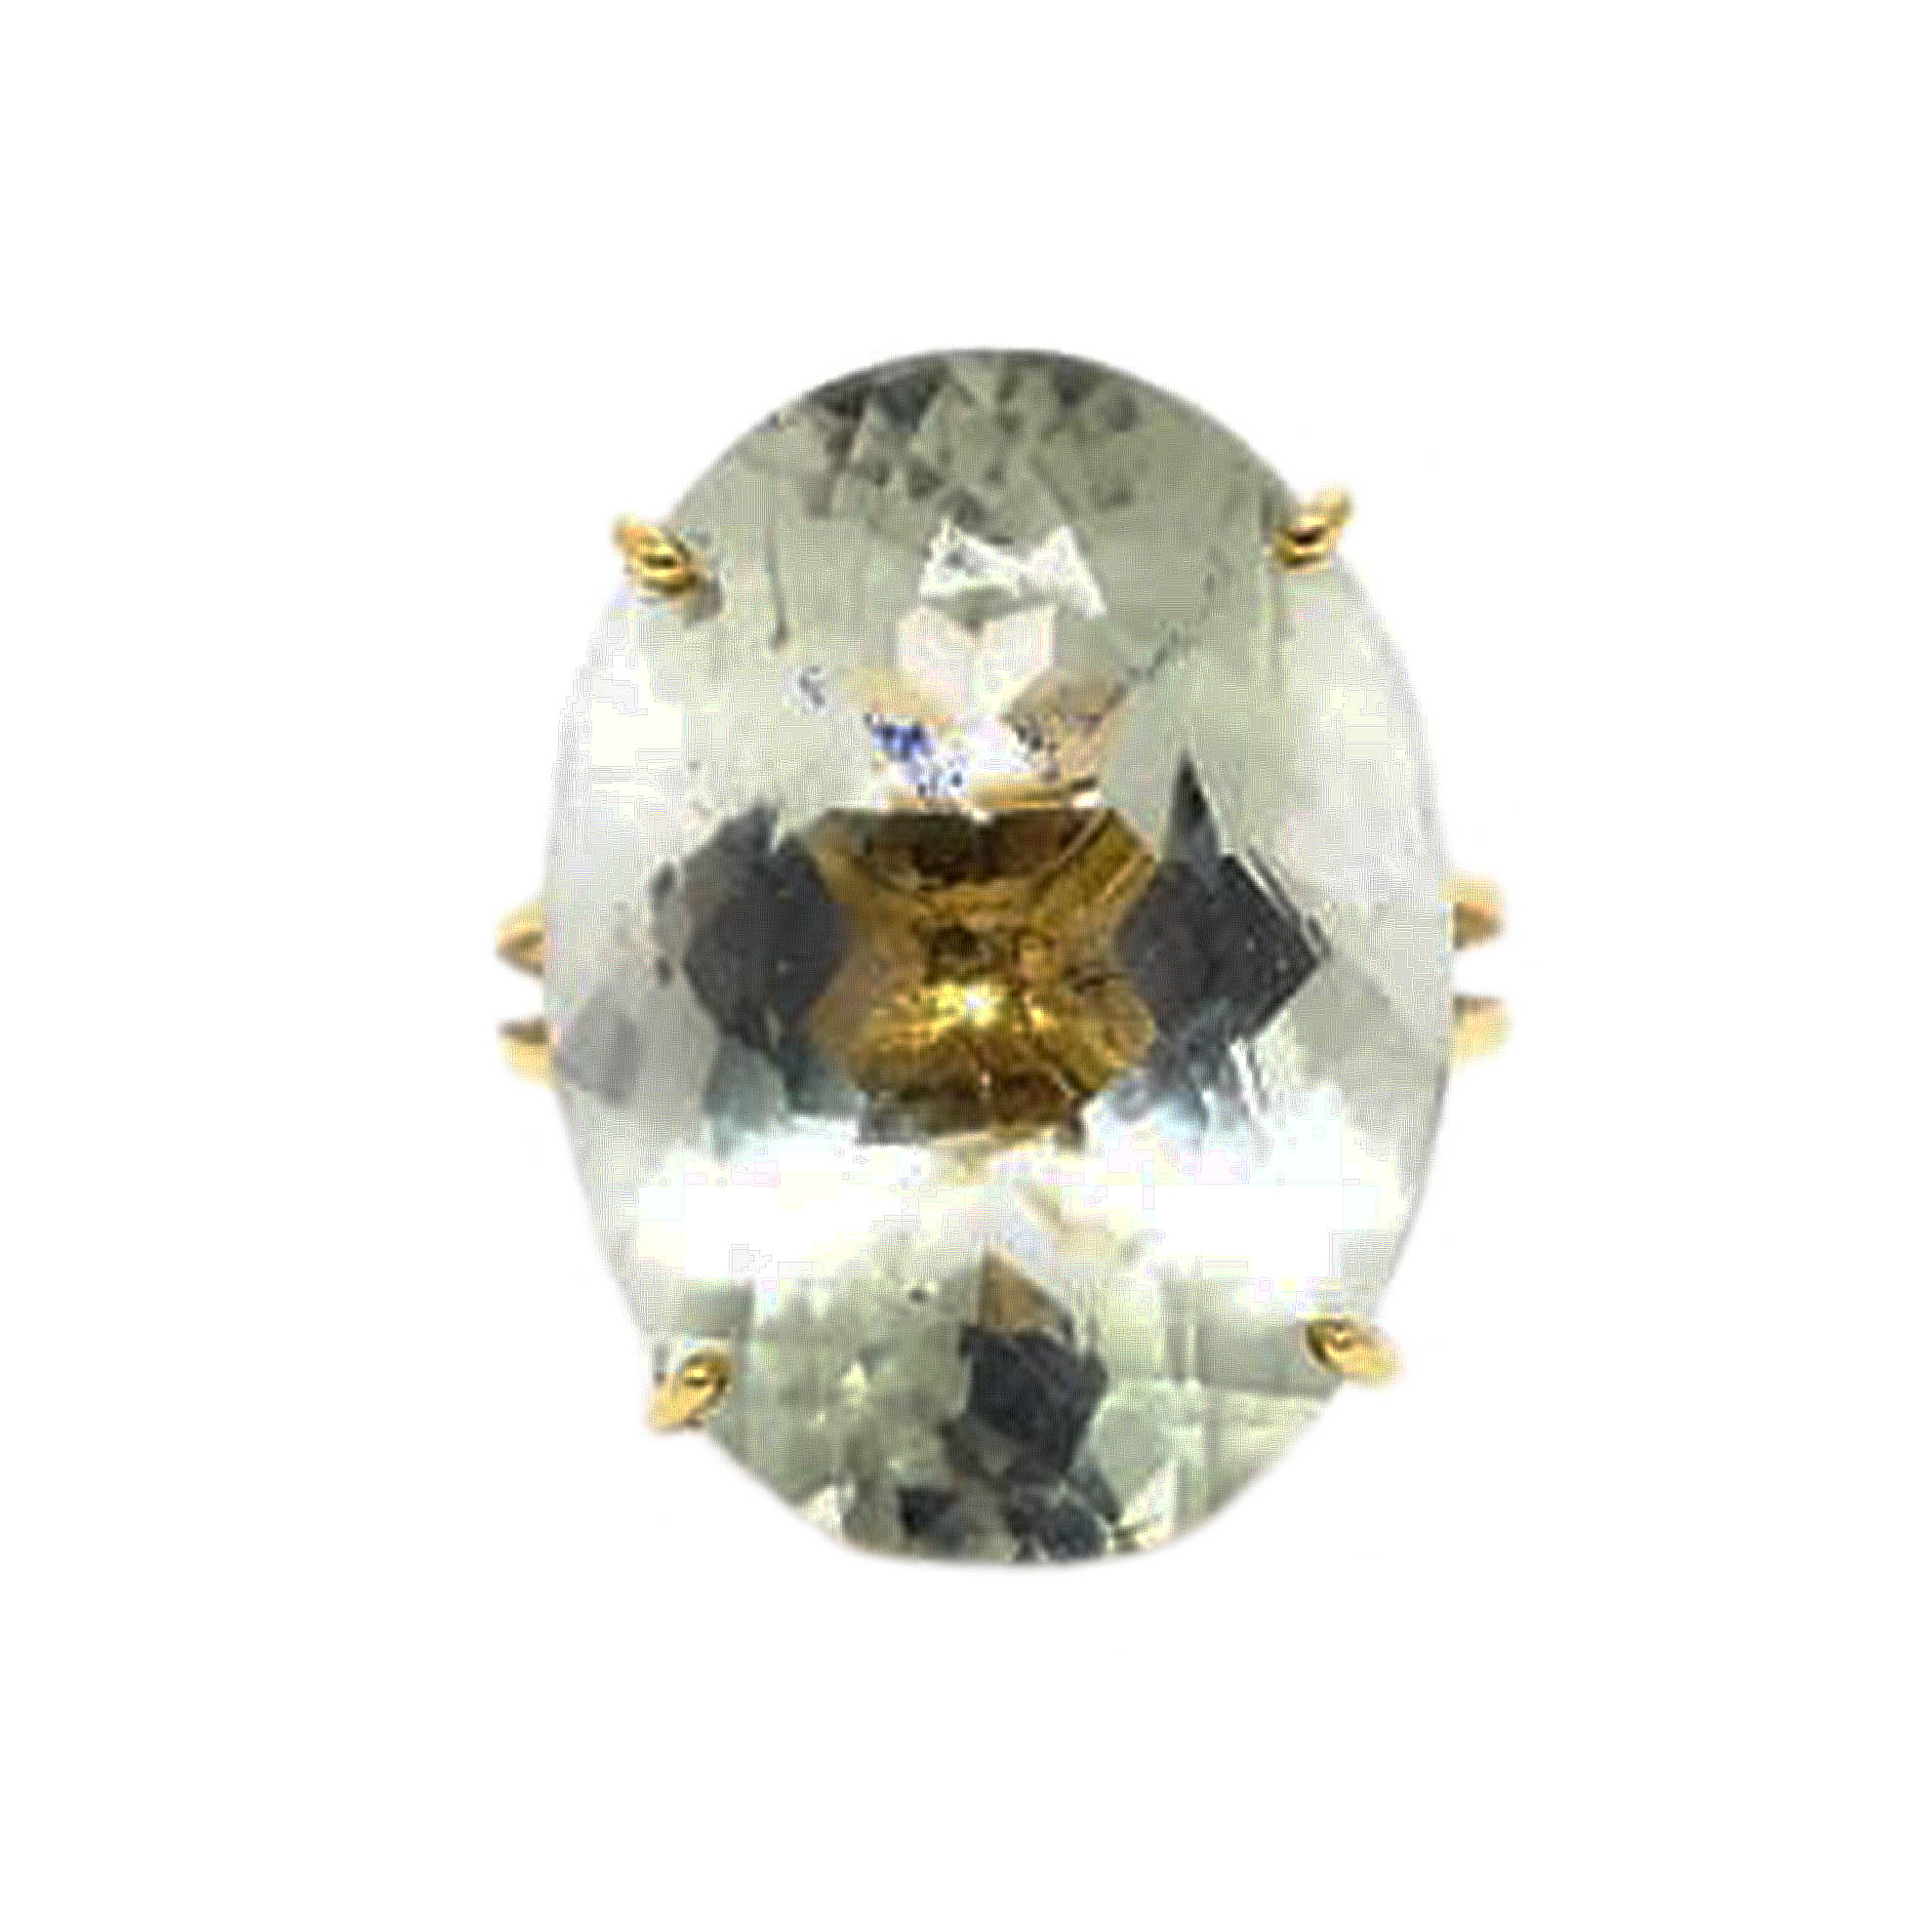 Anel Prazeolita Oval em Ouro 18 Kilates